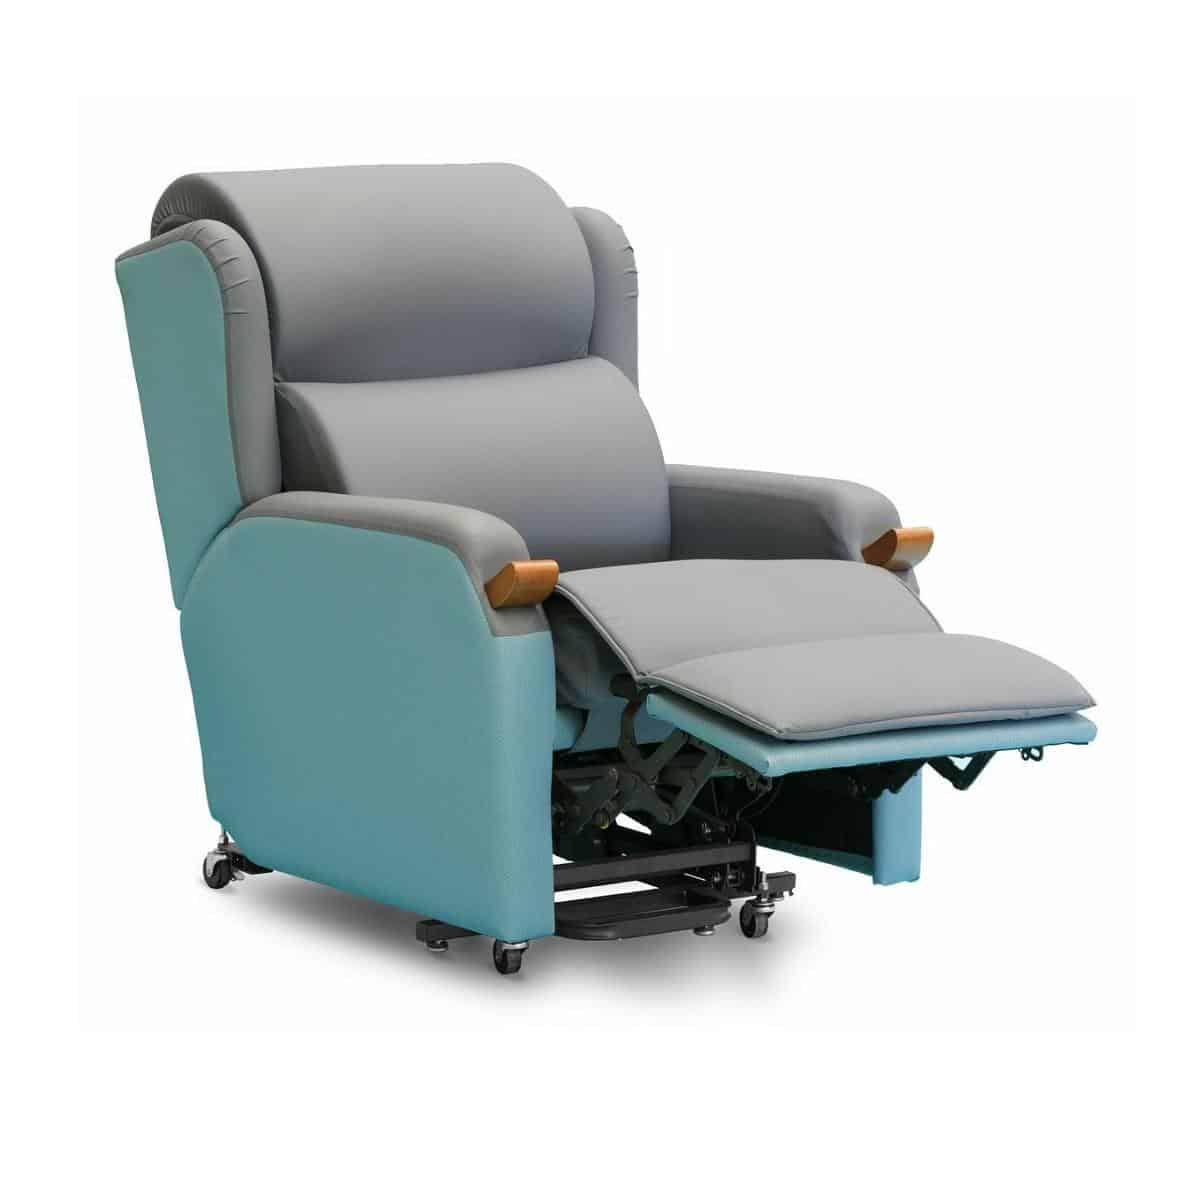 medical chair lift ergo ball reviews compact air comfort willaid health care